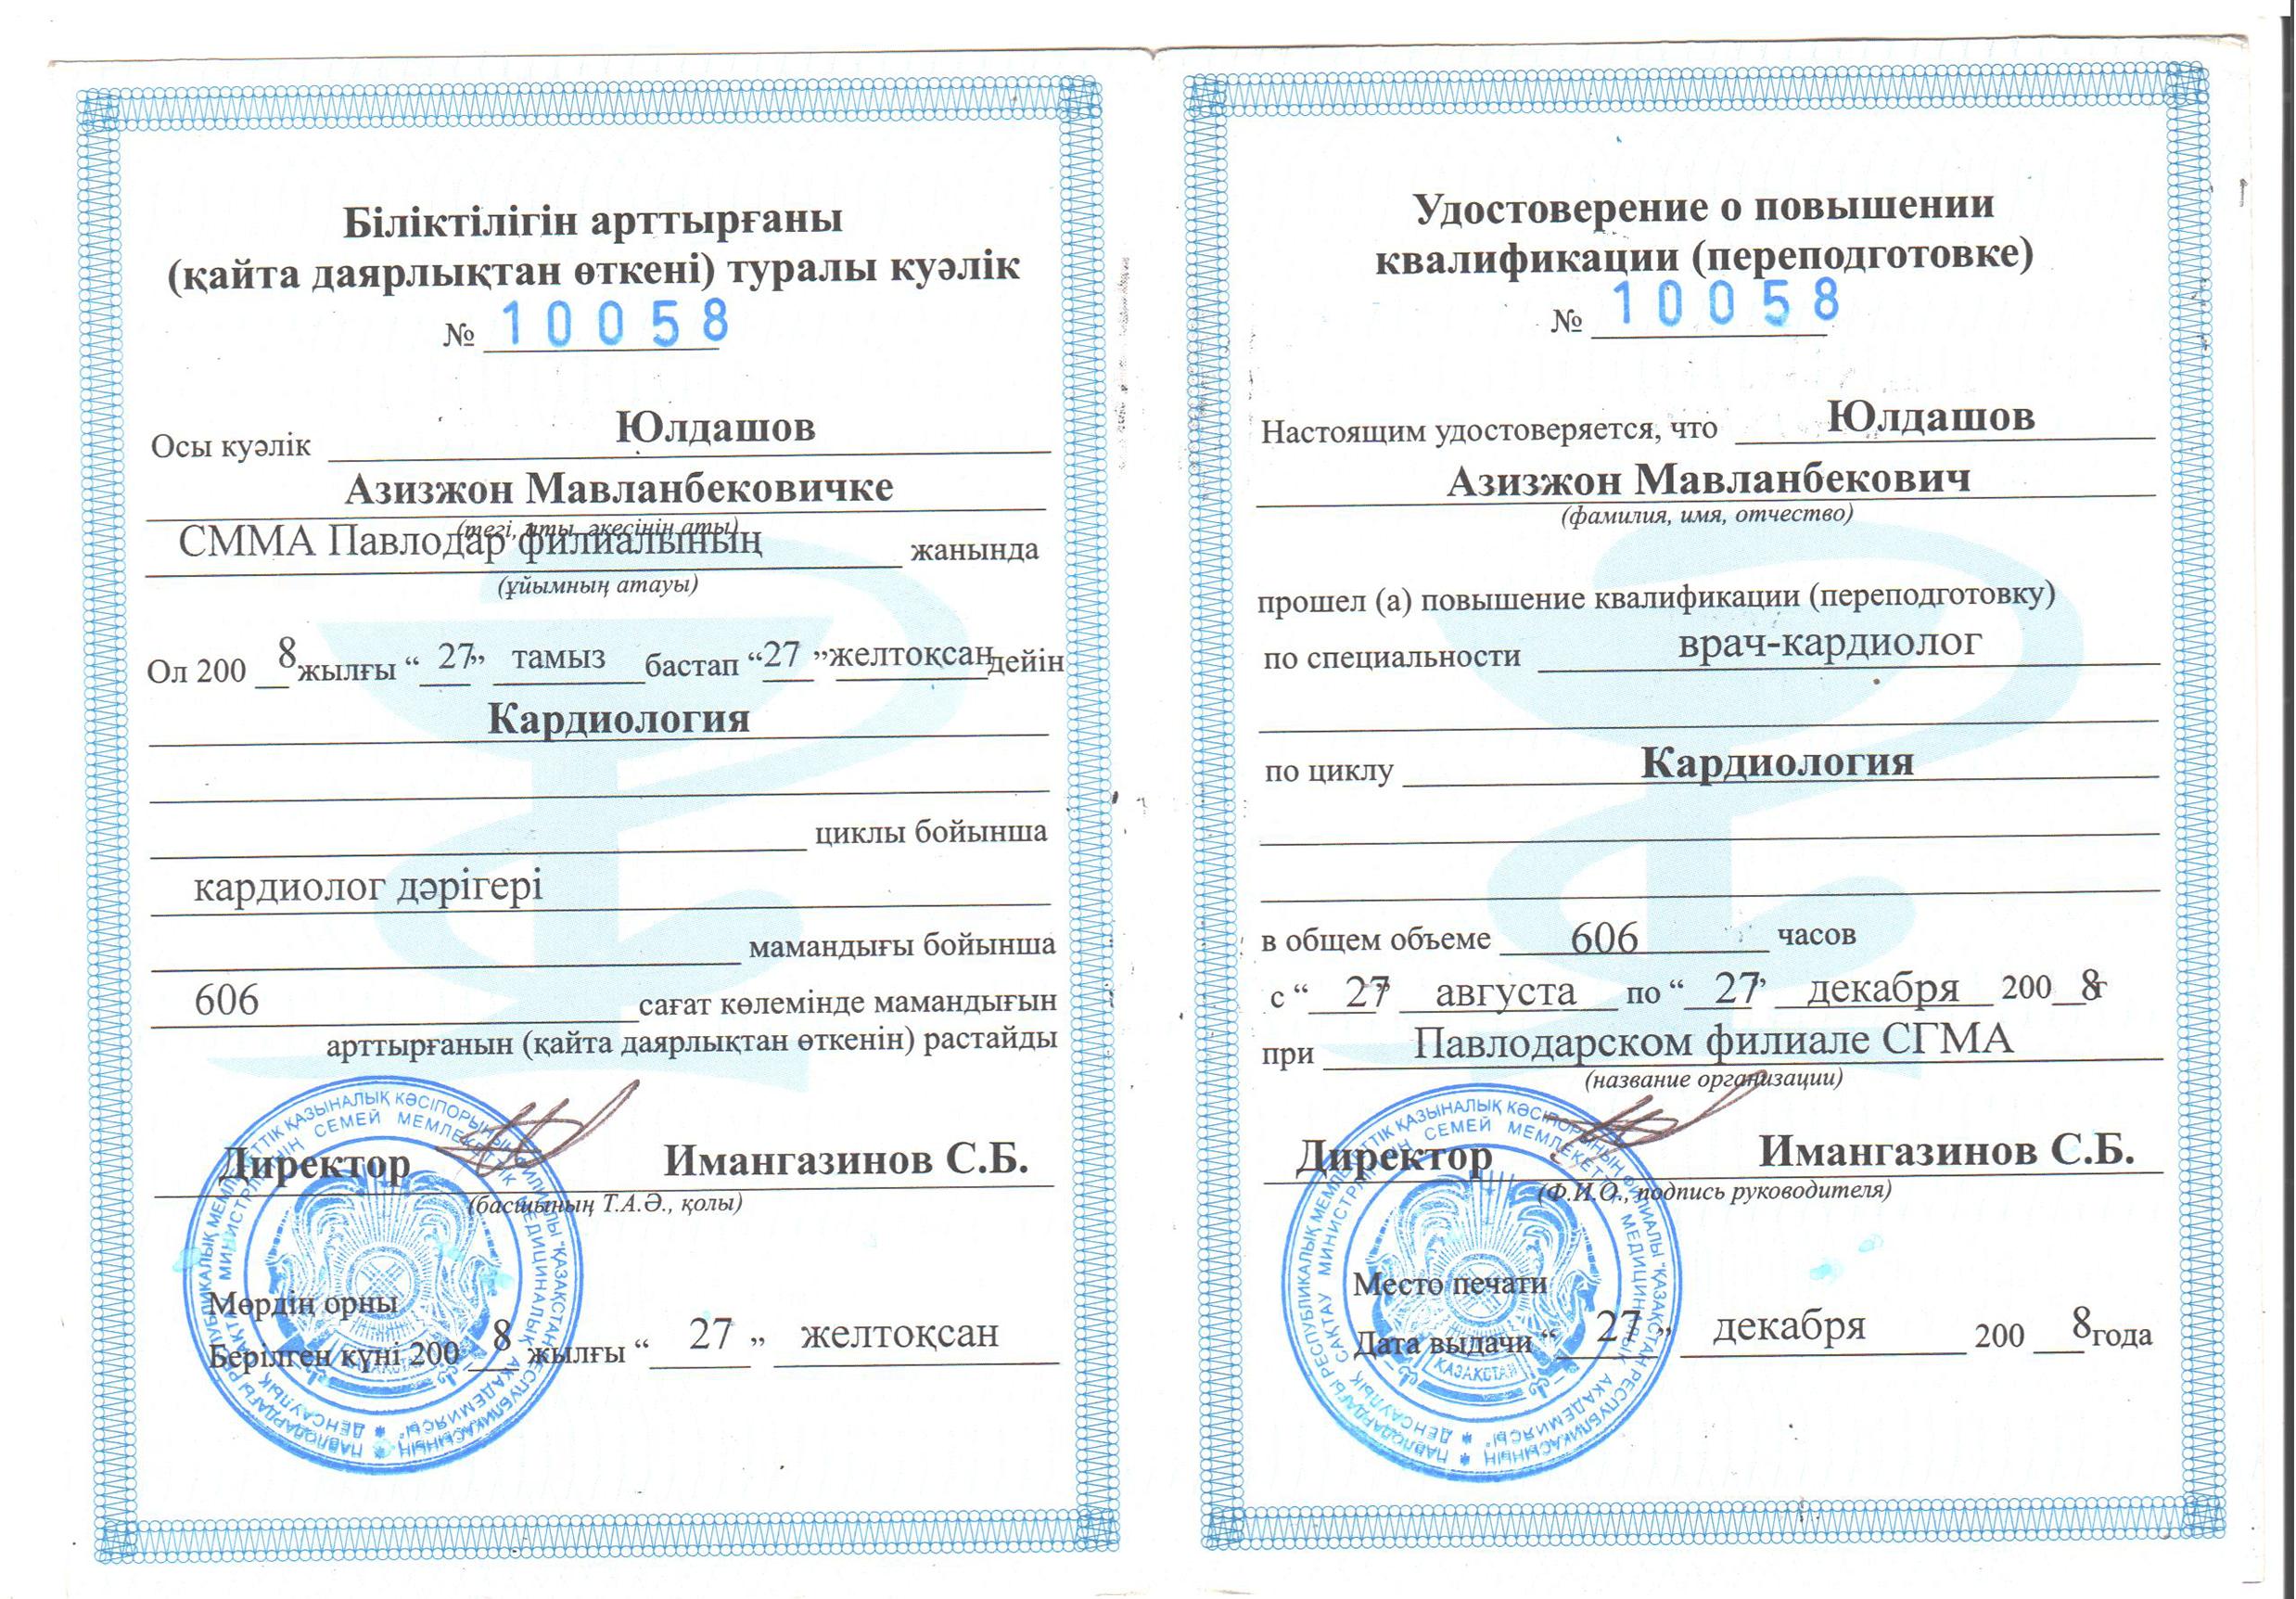 Первичка Кардиолога клиники Akniet Shipa сайрамский р-н. с. Карабулак